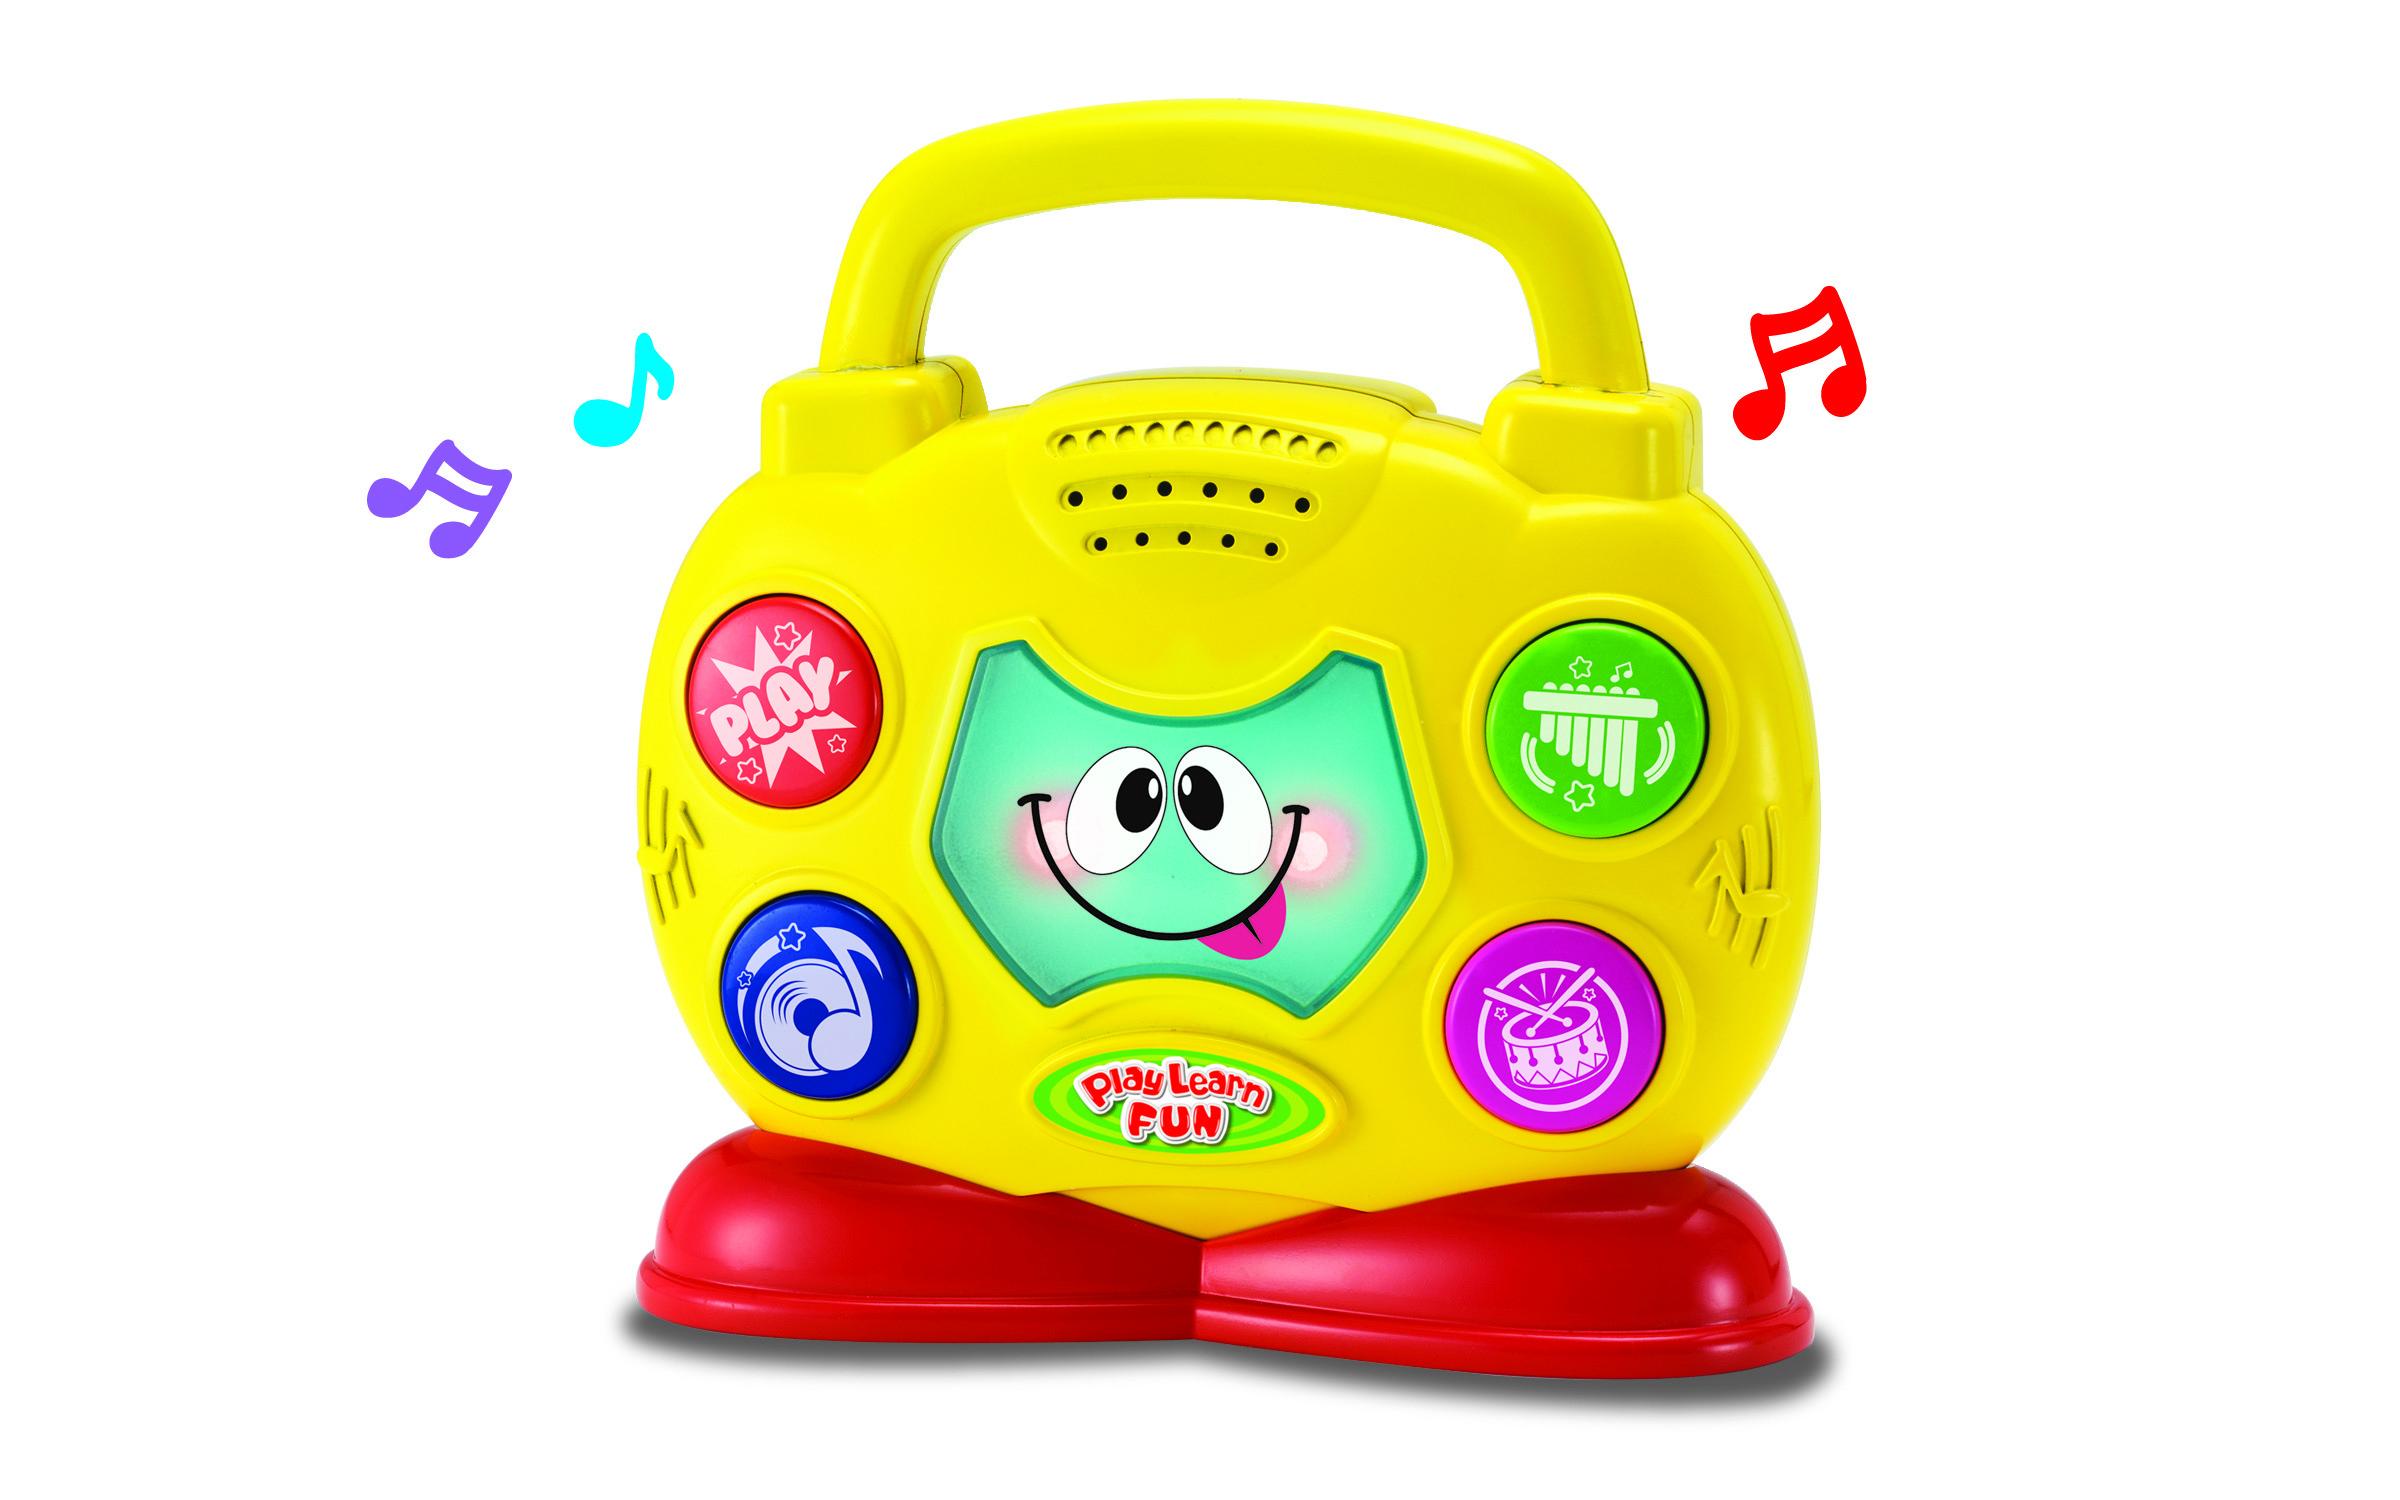 Музыкальные инструменты Keenway Музыкальный бумбокс Keenway желтый цена